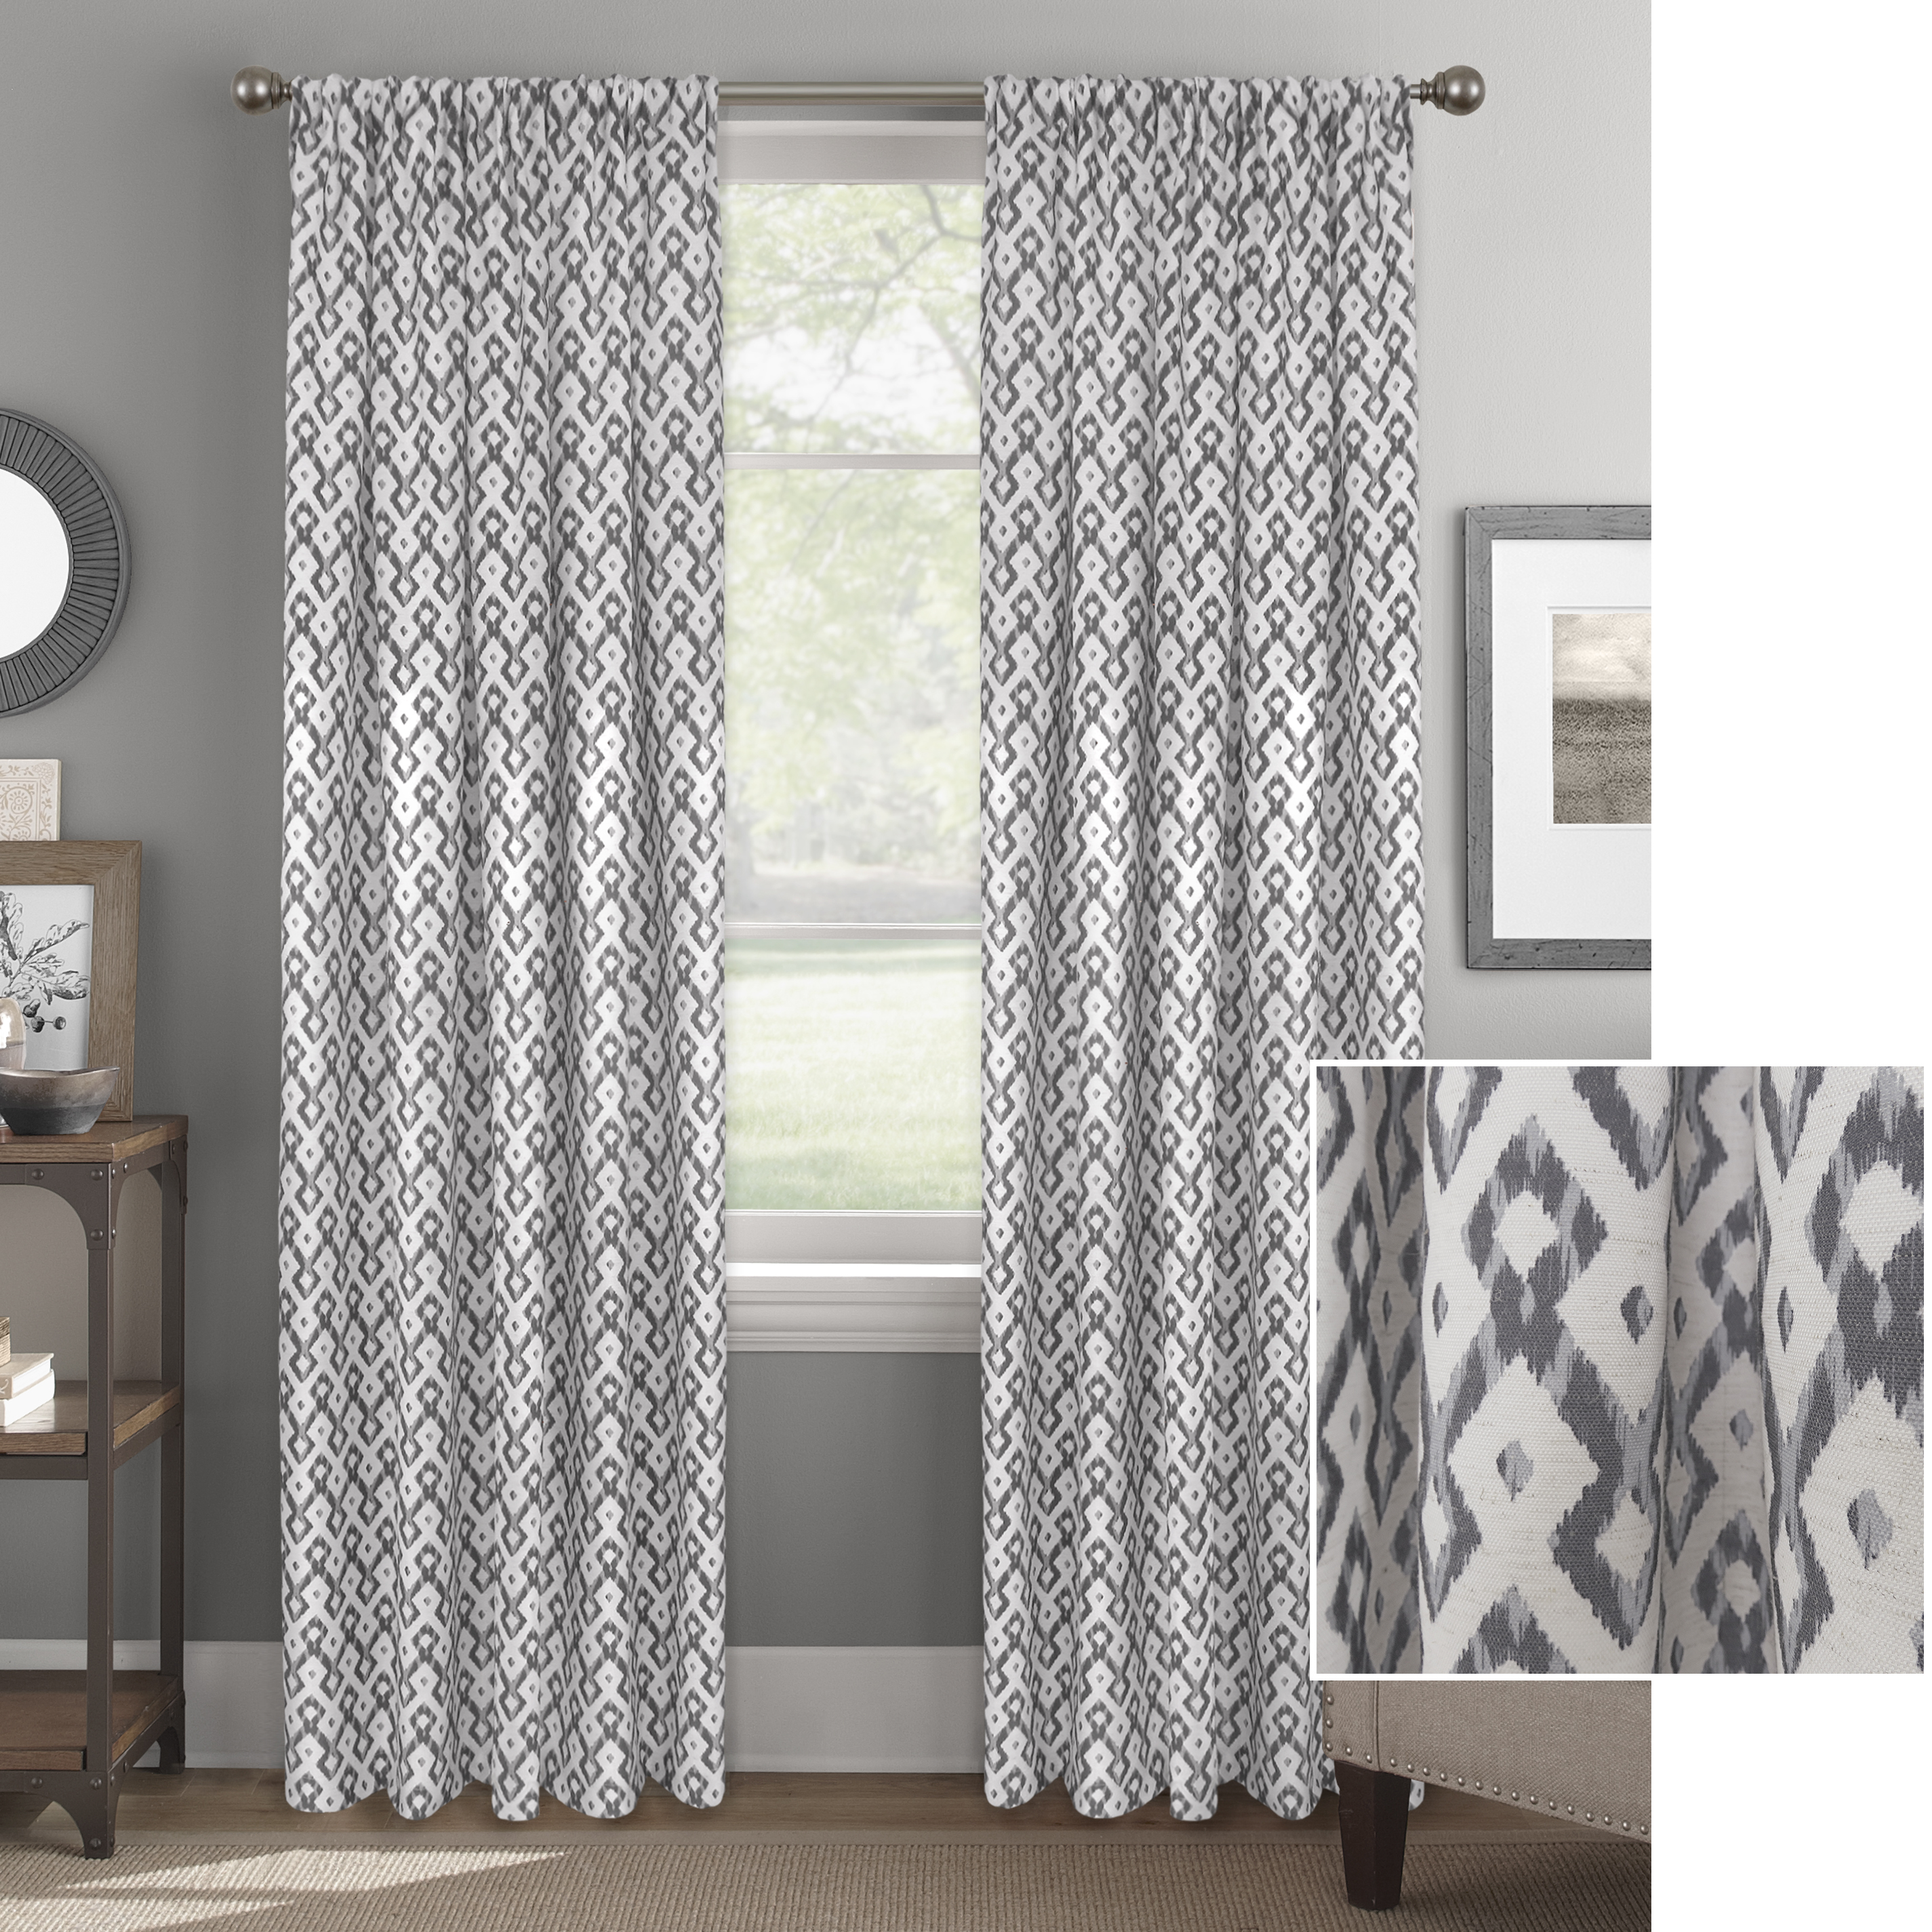 Better Home and Gardens Ikat Lattice Window Curtain Panel